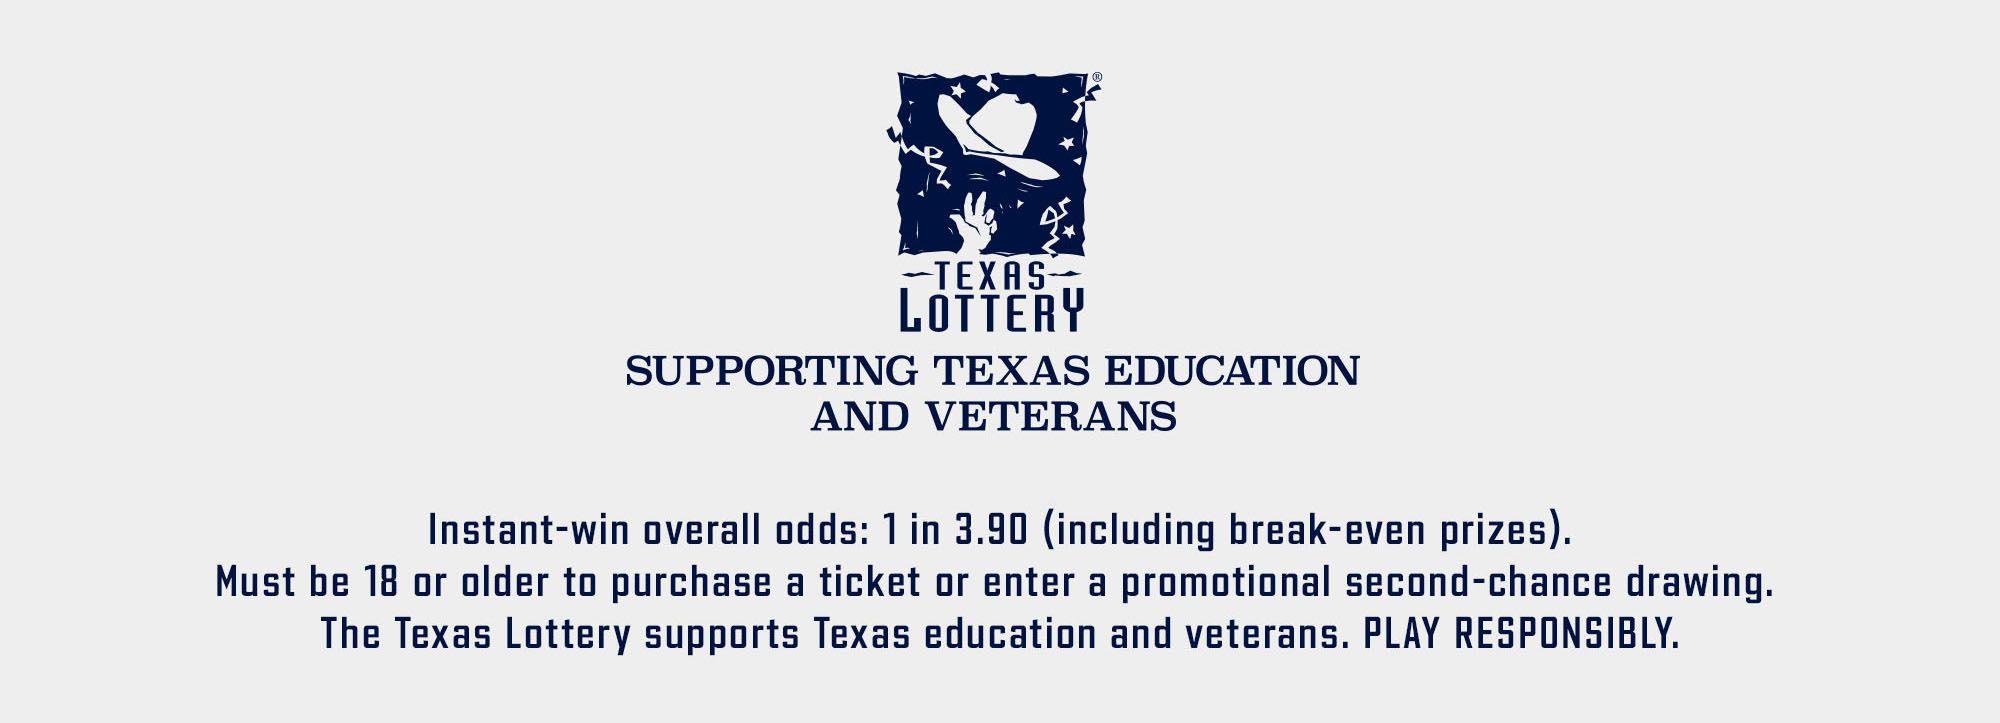 web_TexasLottery2020_Sales_disclaimer